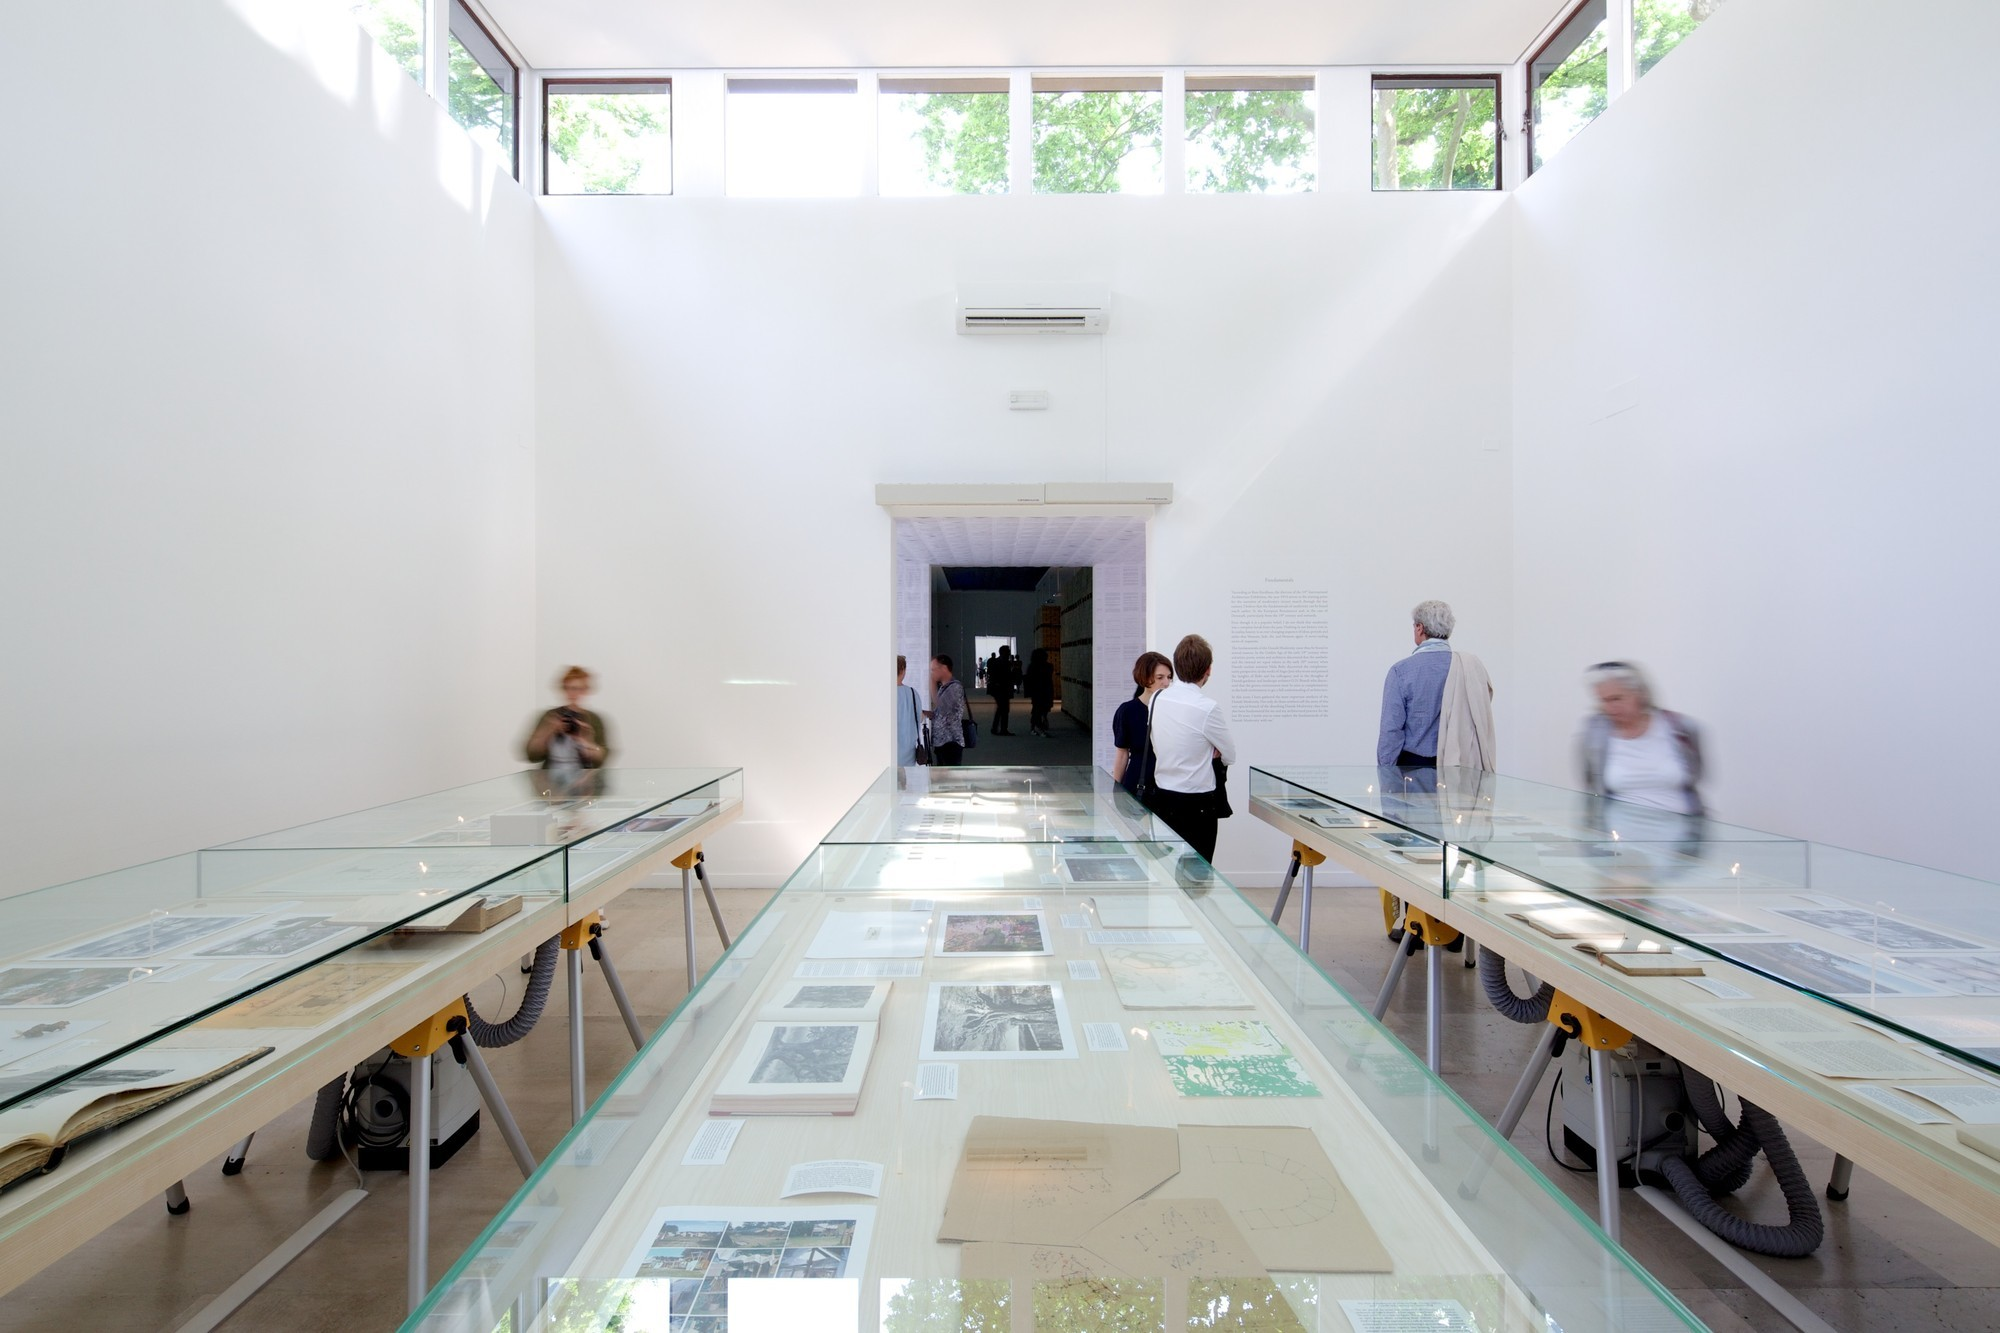 Gallery of venice biennale 2018 danish pavilion to focus for Biennale venezia 2018